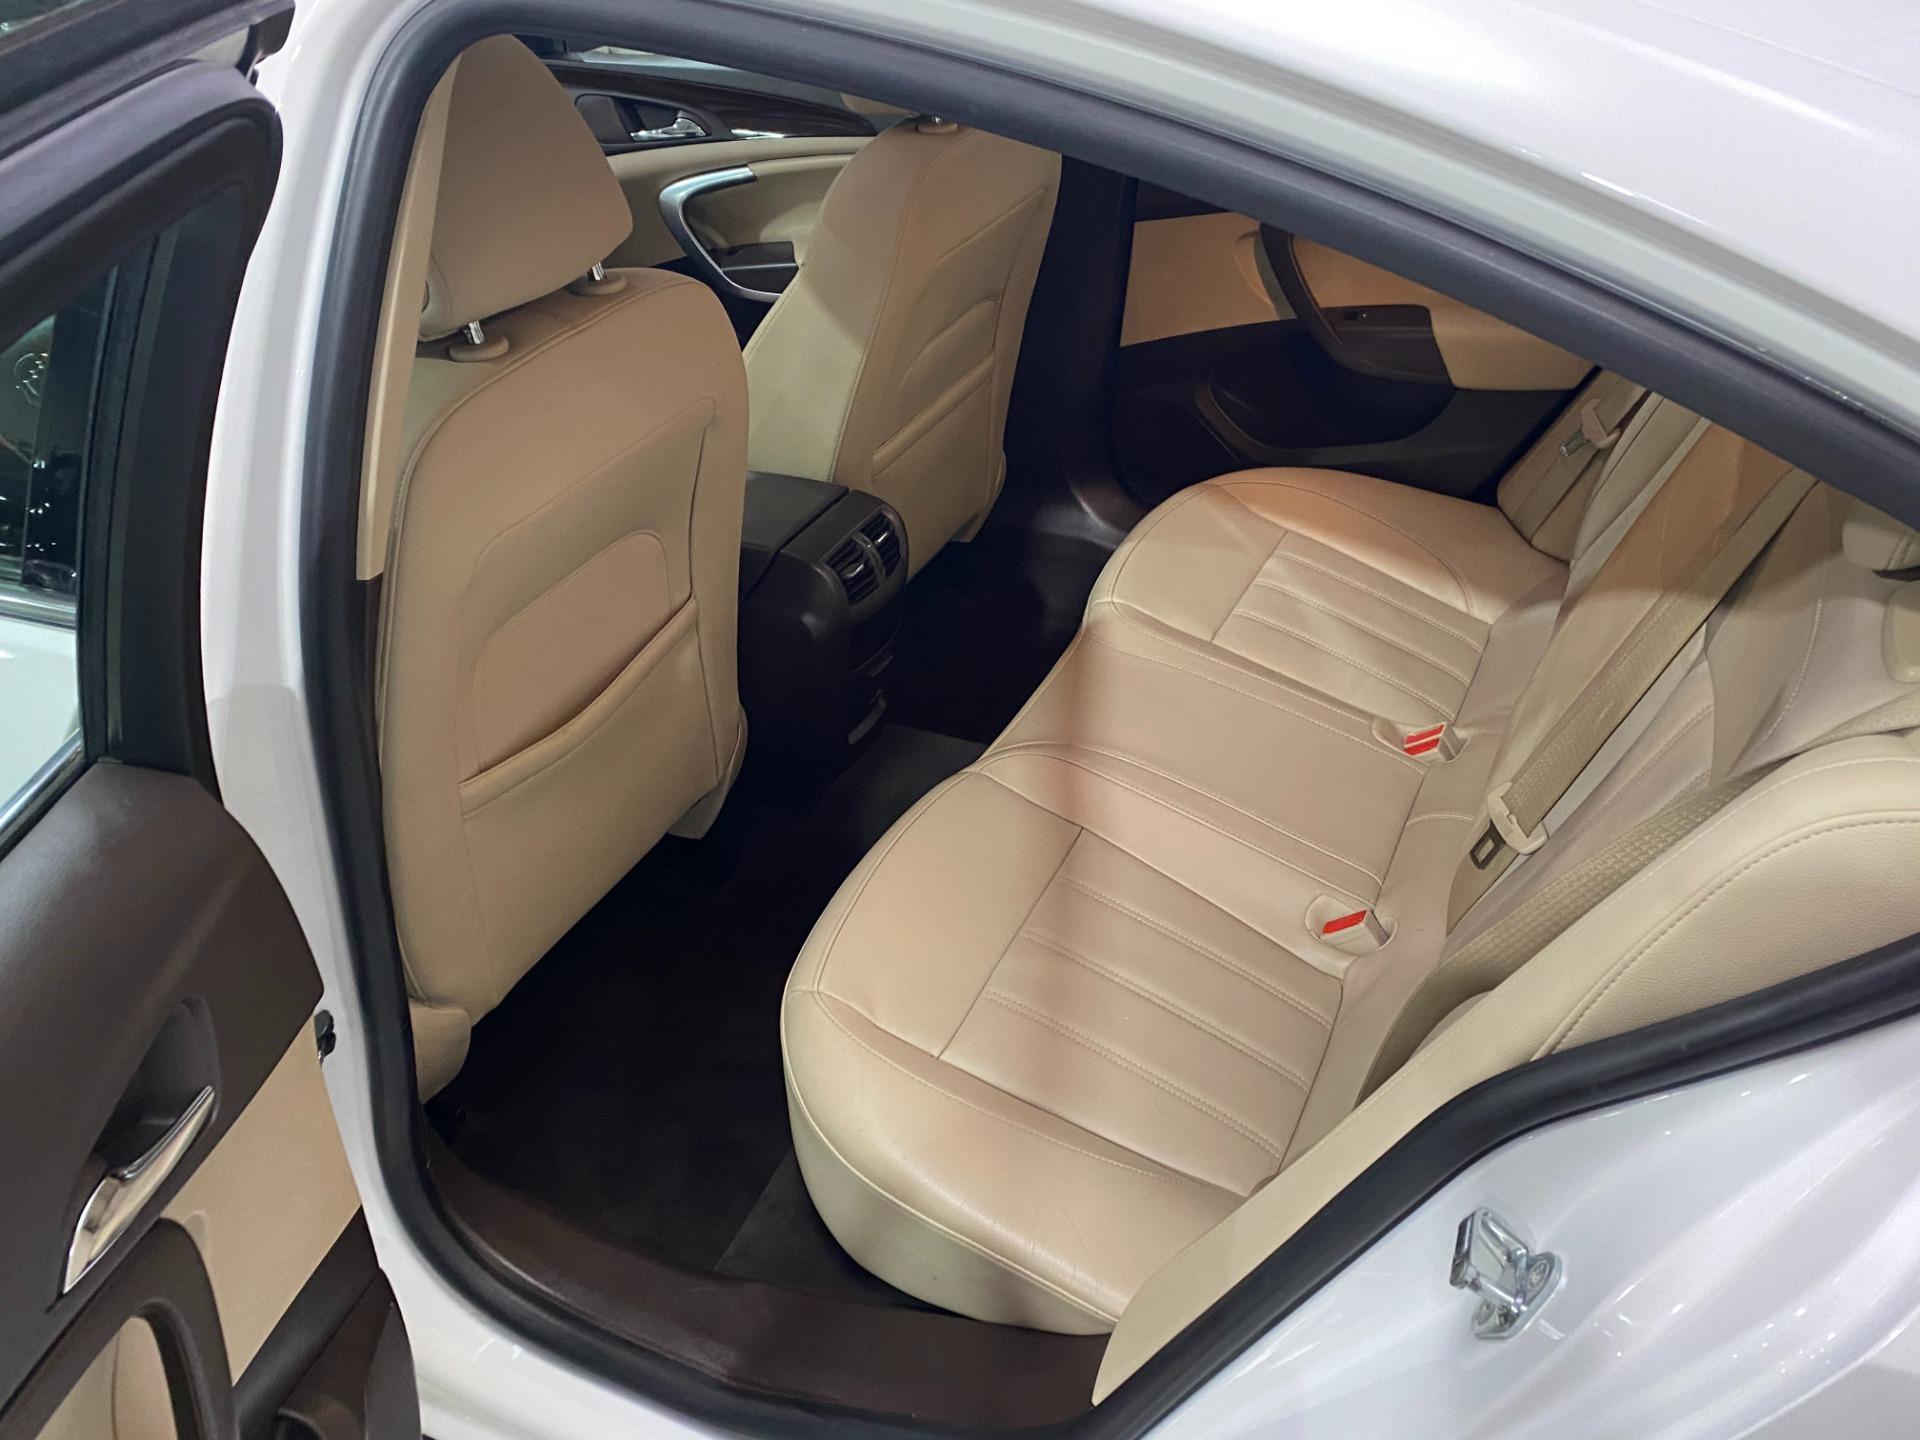 Used-2011-Buick-Regal-CXL-Turbo-Rasmussen-Edition